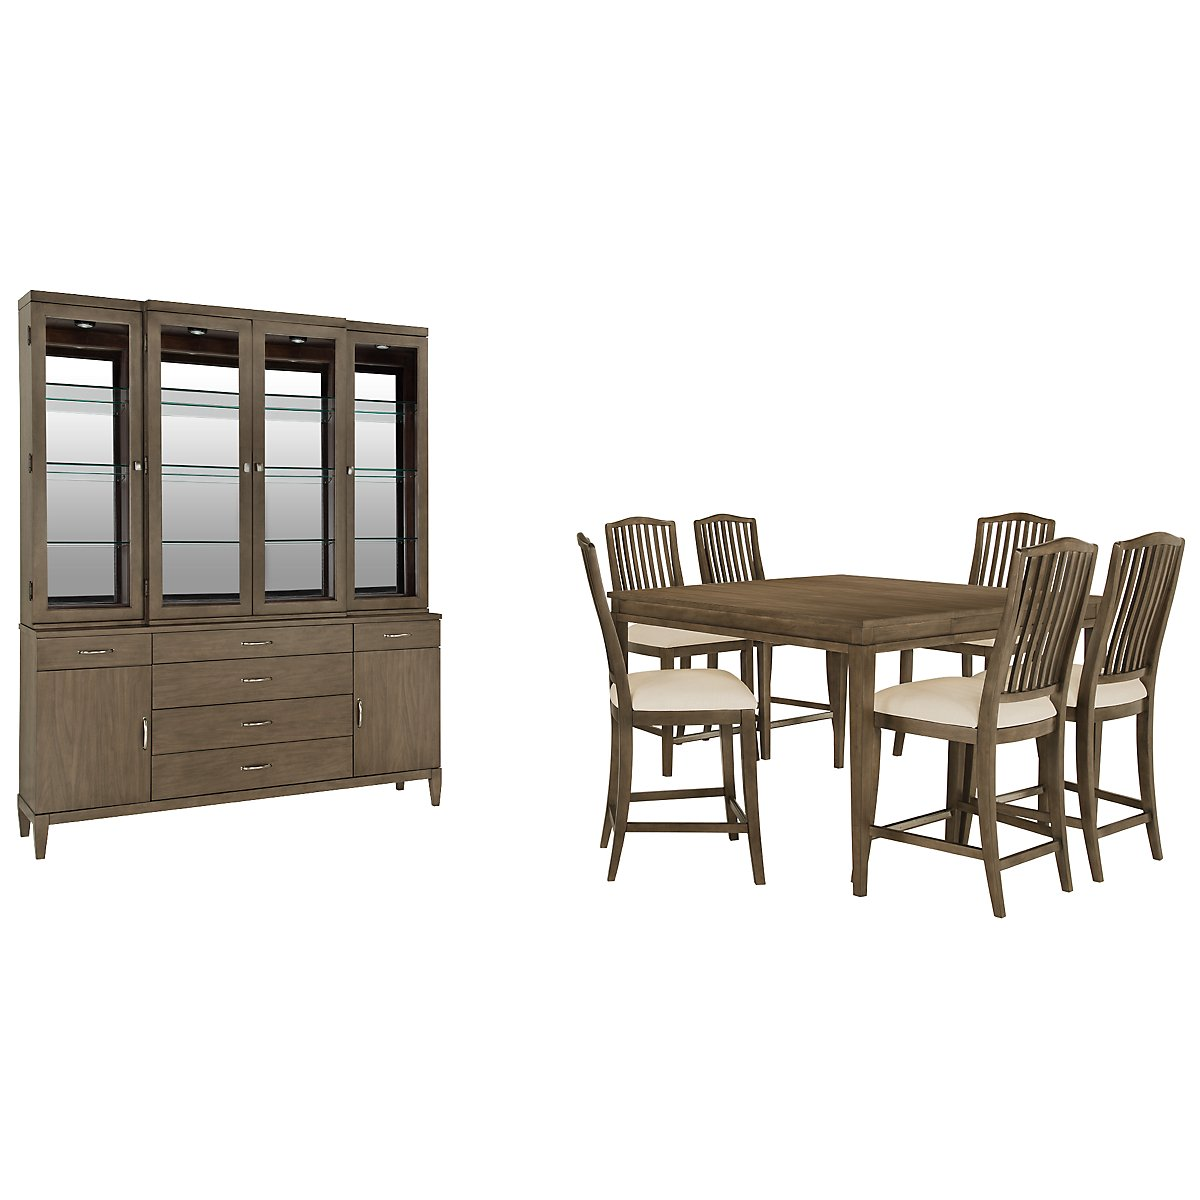 Preston Gray Rectangular High Dining Room